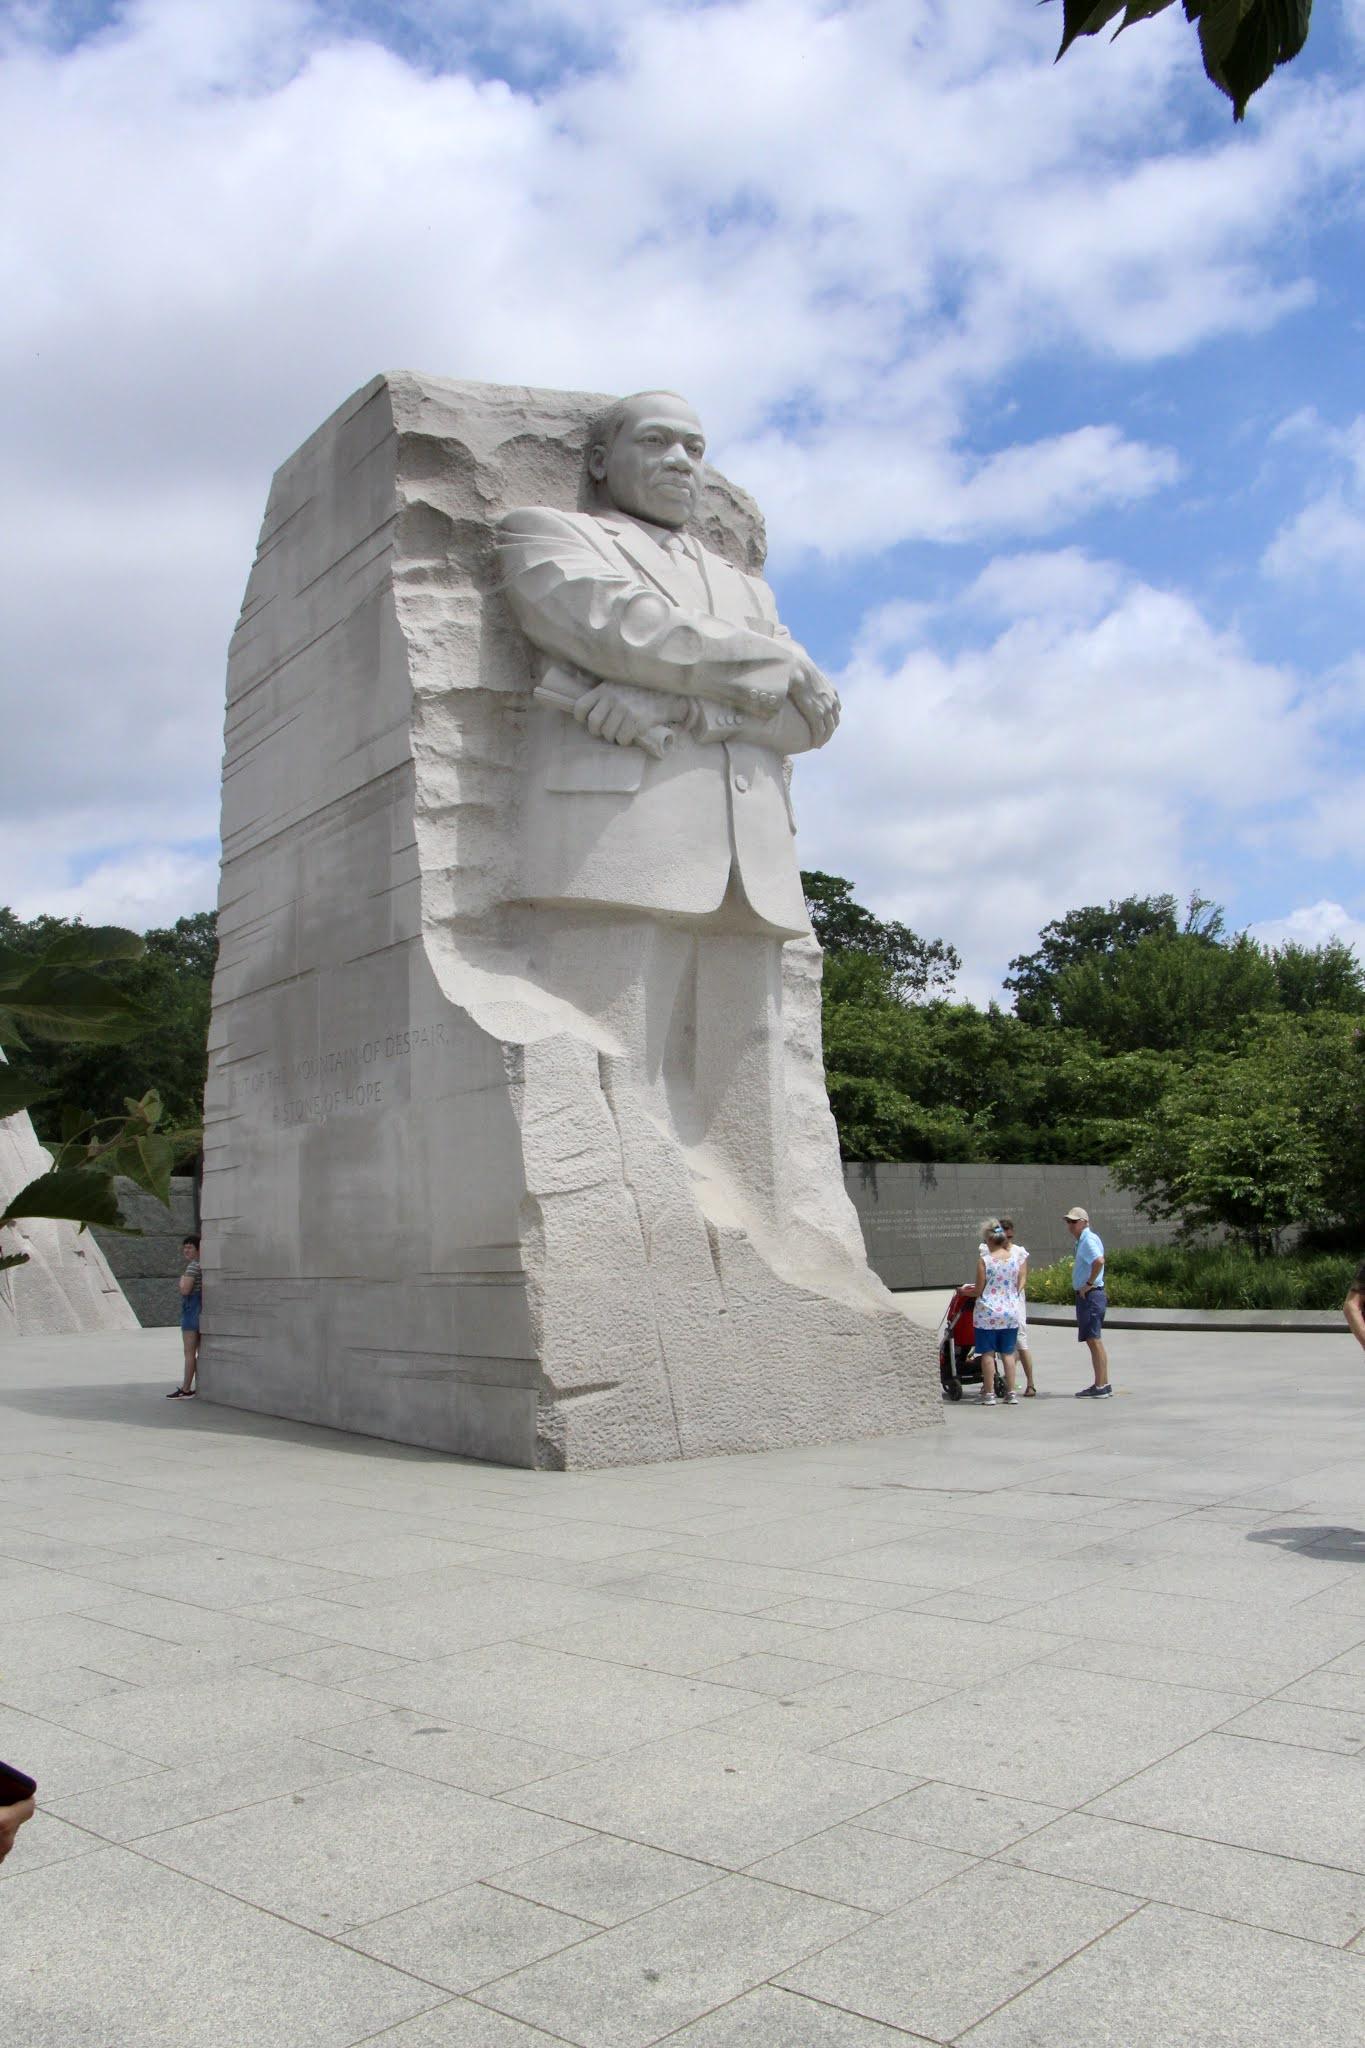 monuments, washington dc, travel guide